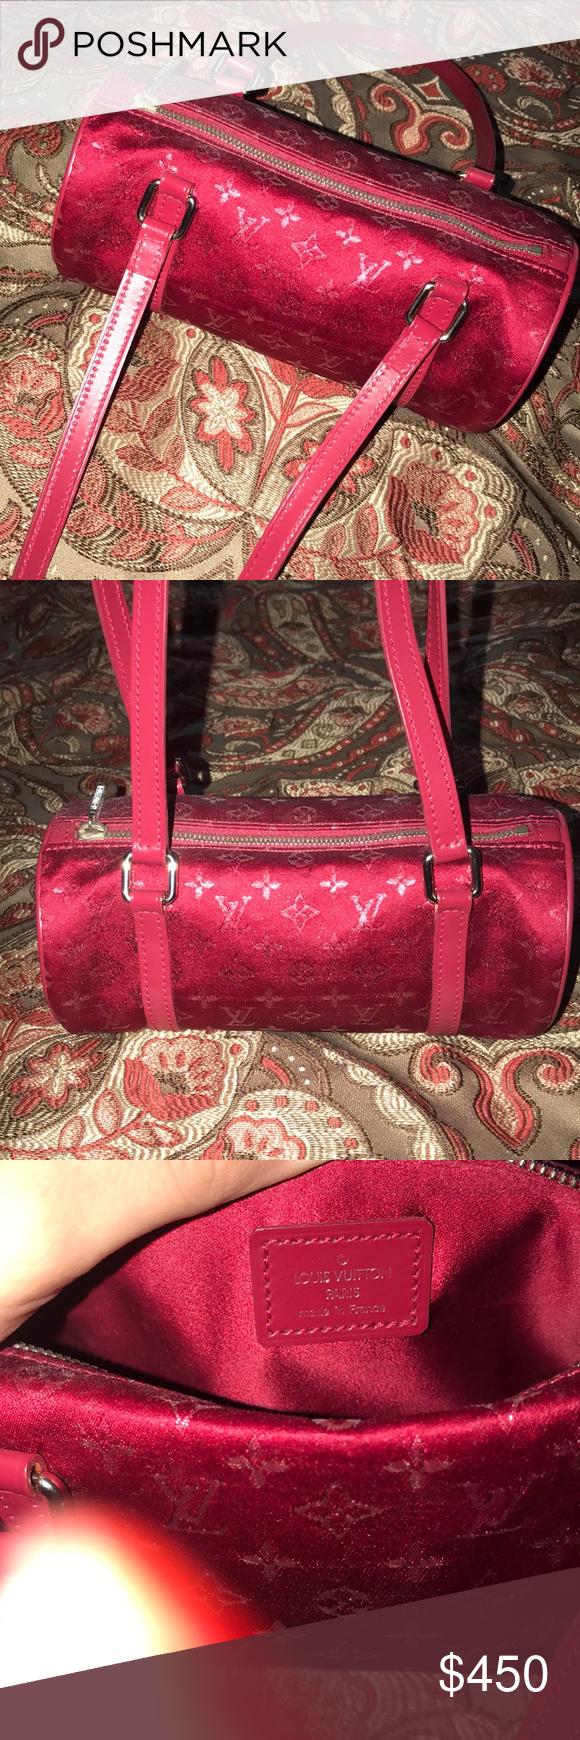 "b8250950bc6b Louis Vuitton Monogram satin Mini Papillon Bag Authentic ! Date code is  TH1002 Width is 7.25"" Depth 3"" Height 3"" Shoulder strap drop 8"" Beautiful  condition ..."